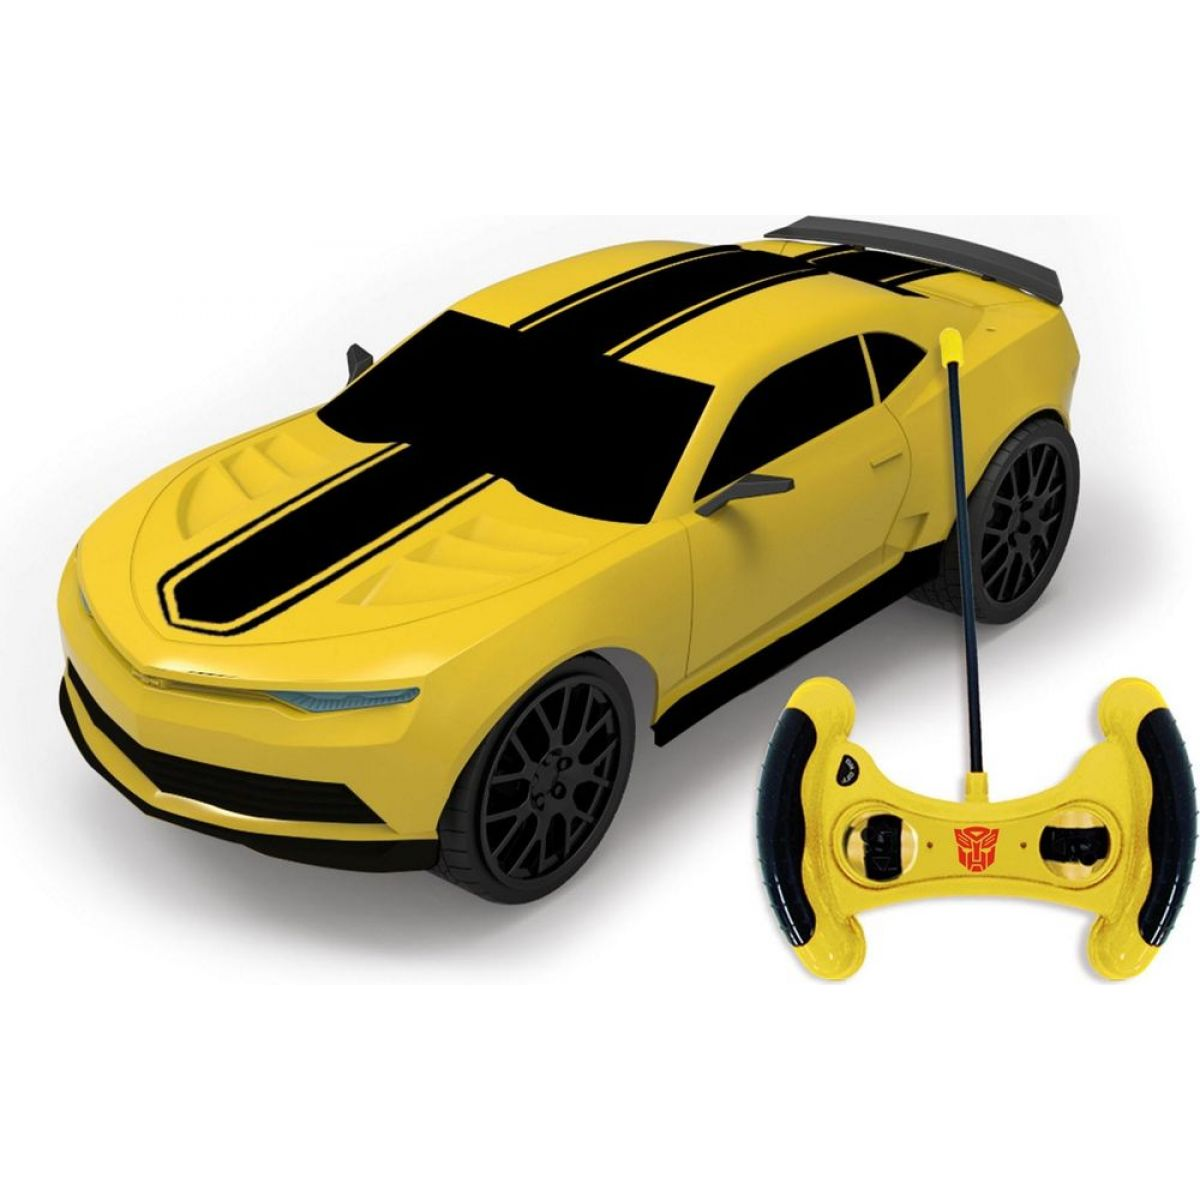 Transformers RC Auto Bumblebee